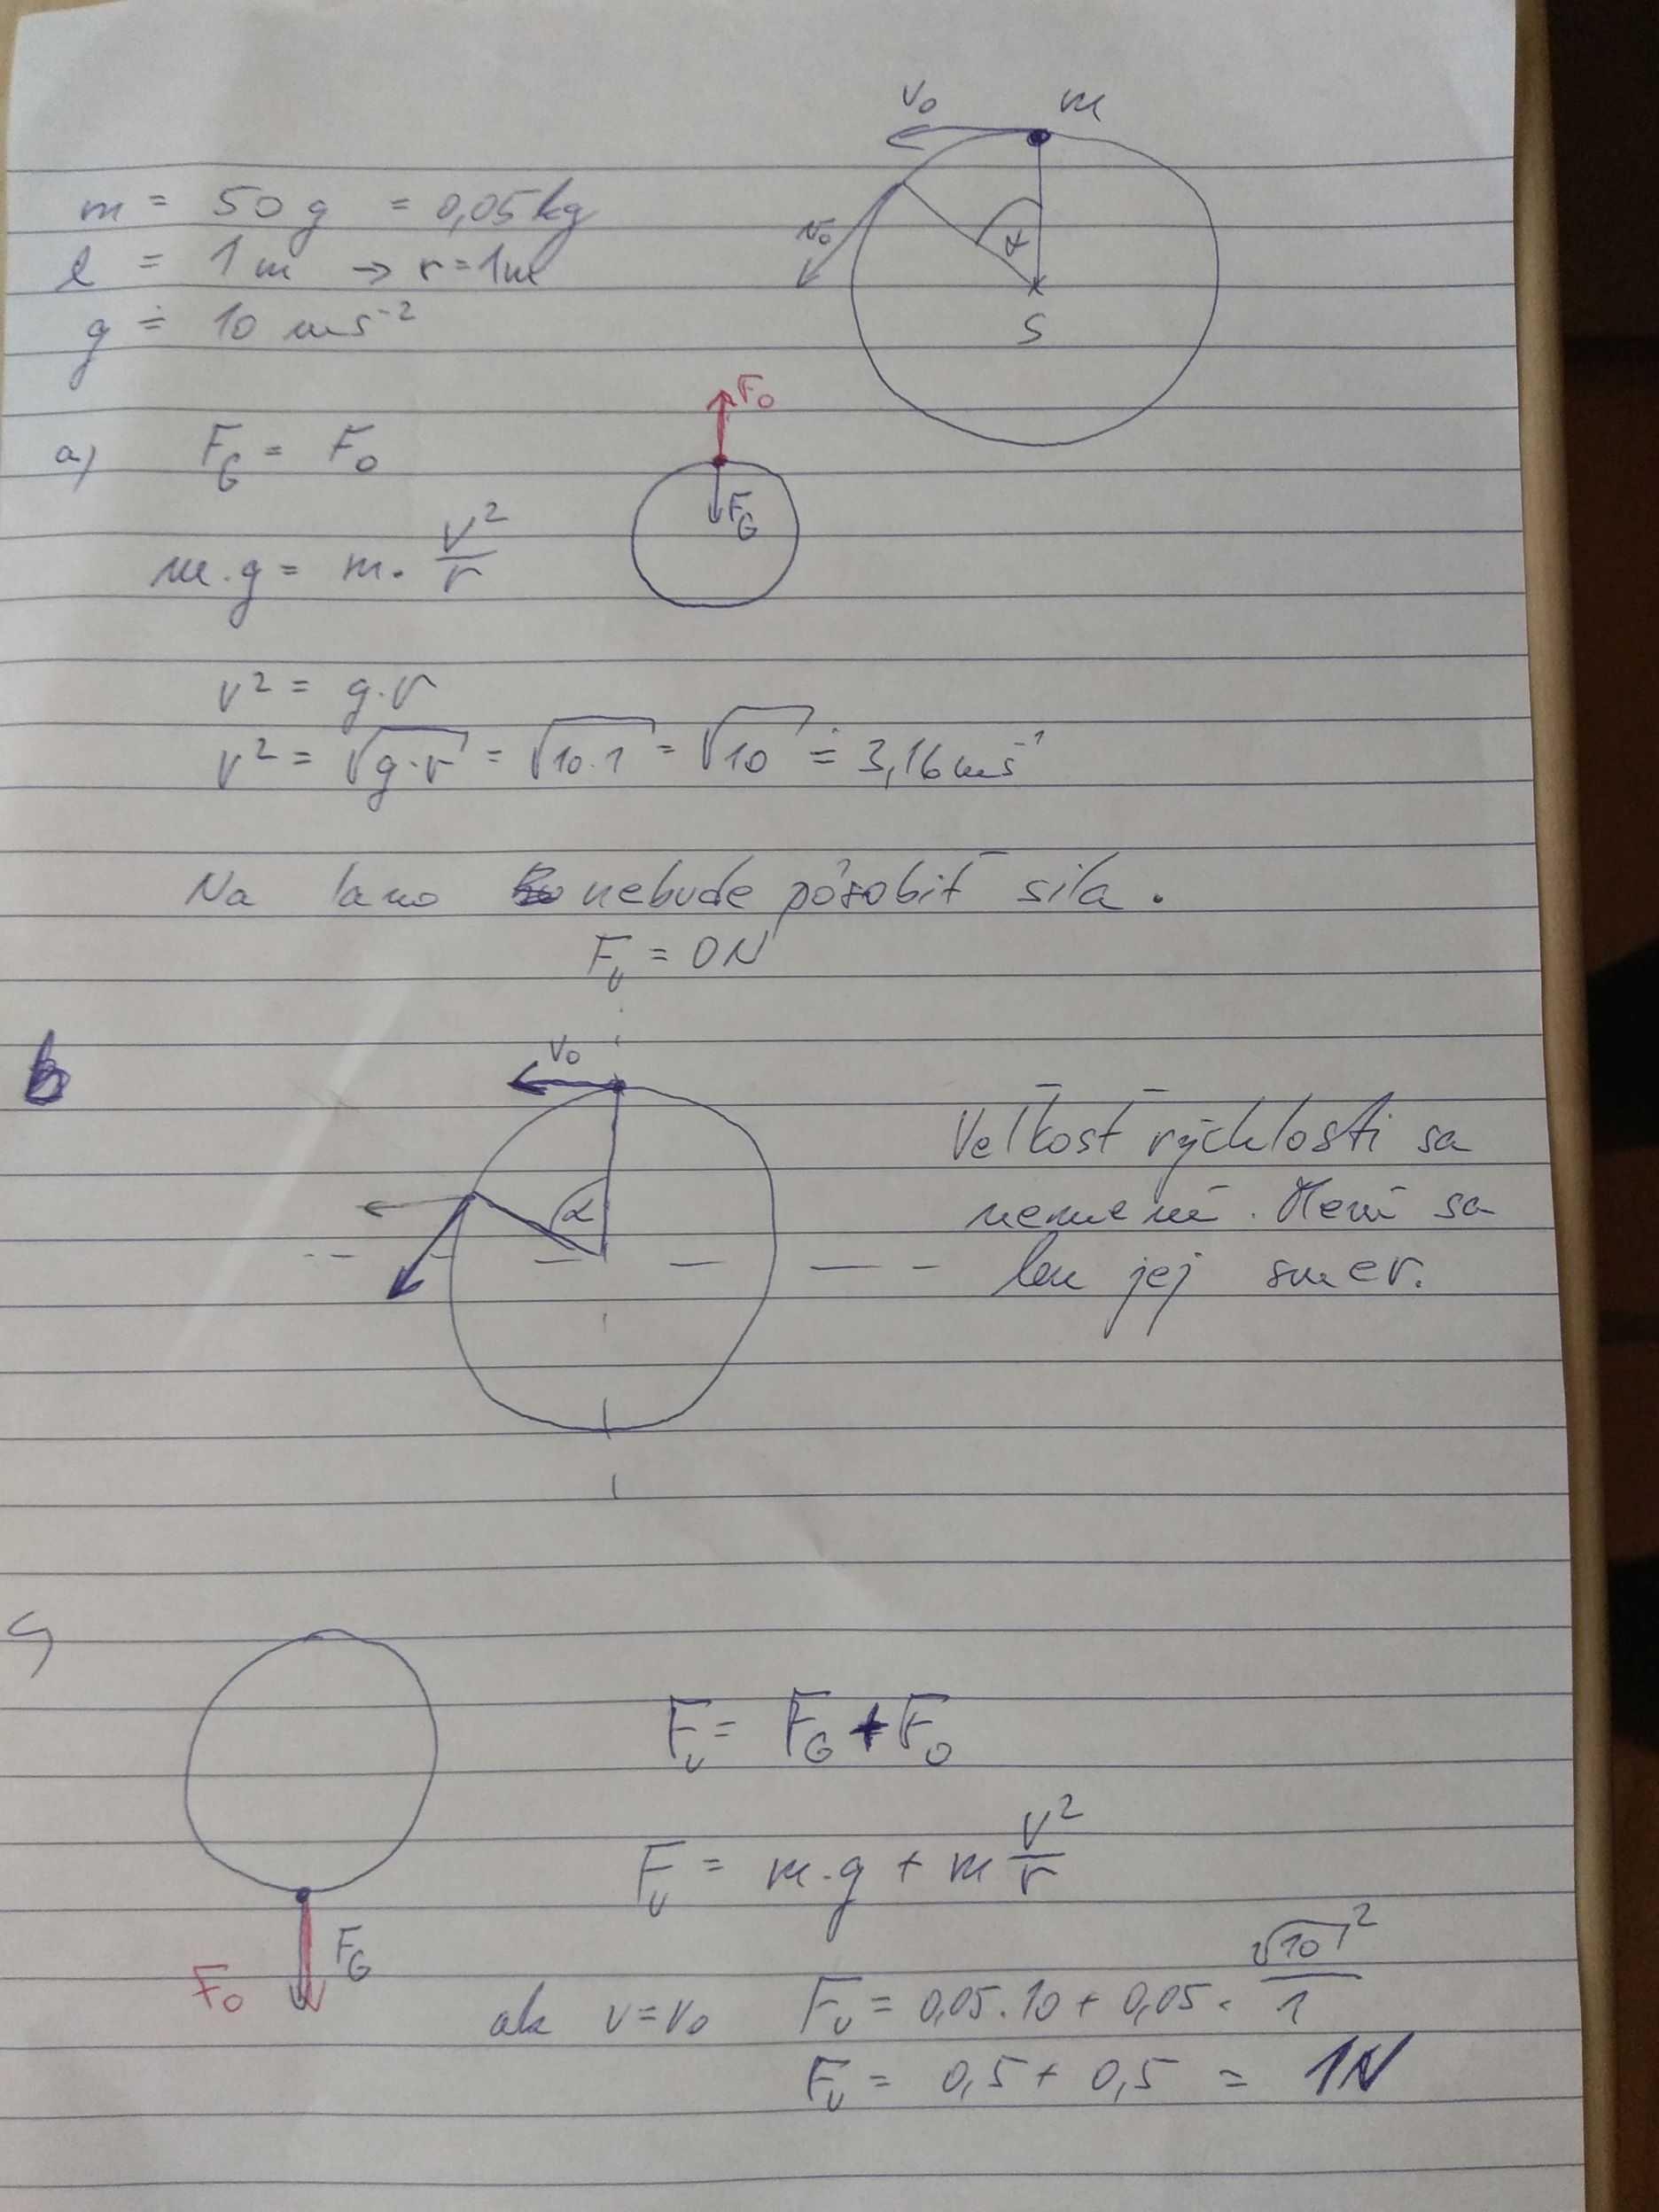 http://forum.matematika.cz/upload3/img/2018-06/44989_riesenie2.jpg